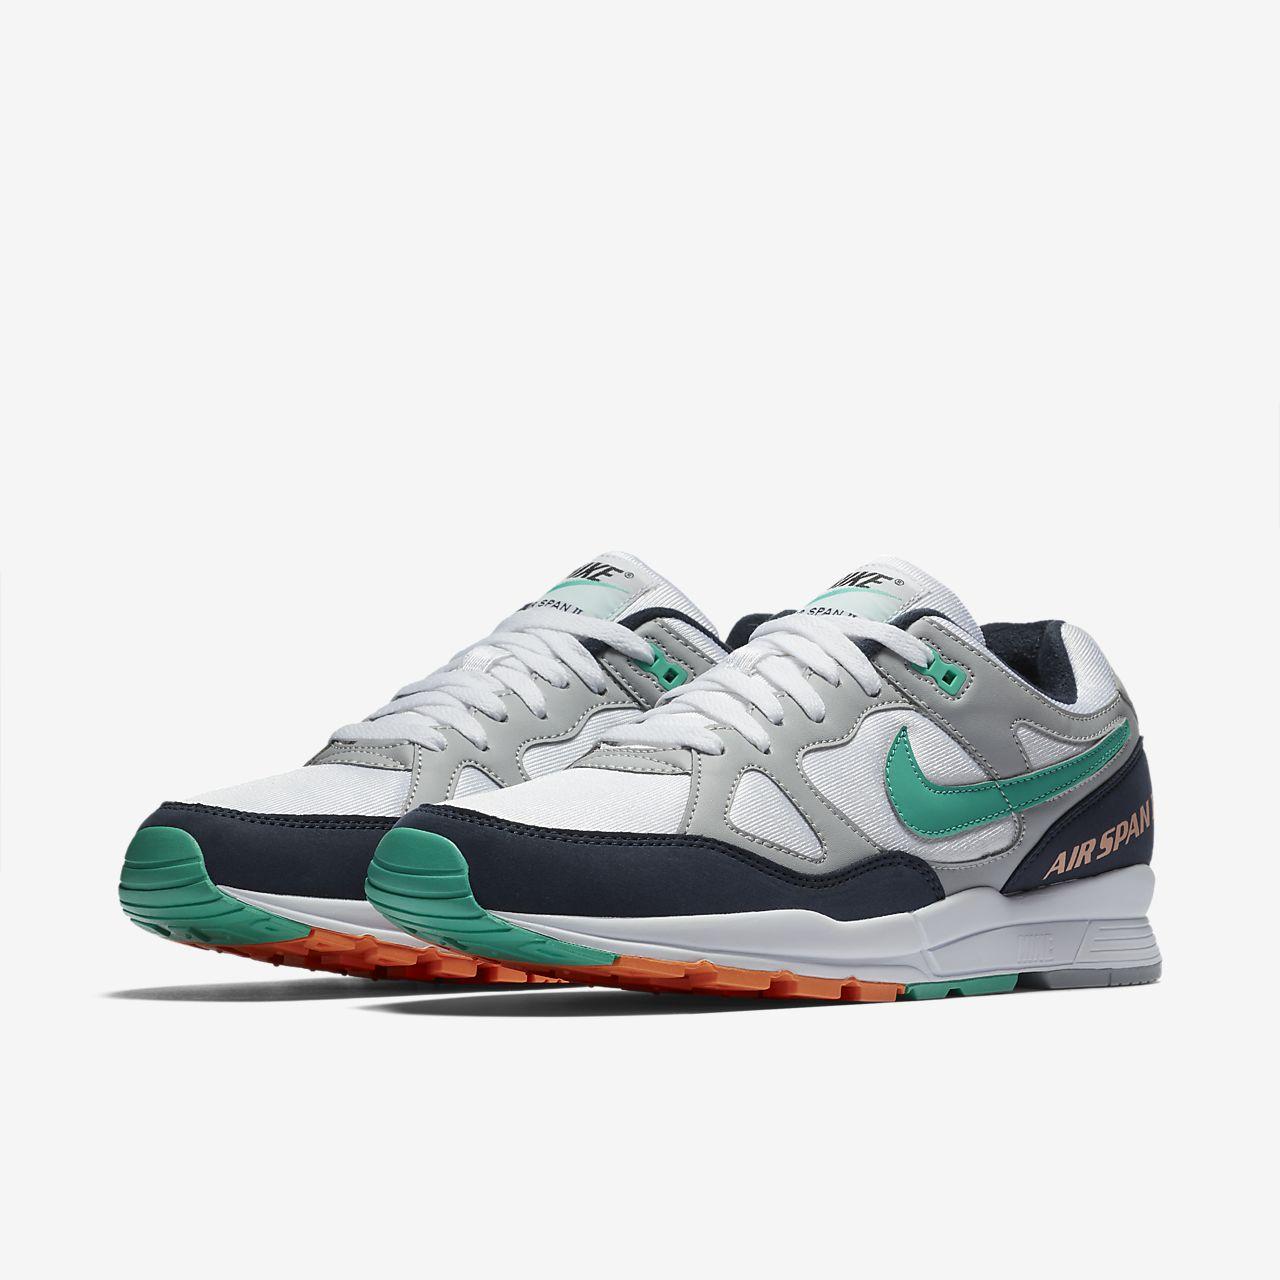 ef6843586b895 Nike Air Span II Men's Shoe. Nike.com NL